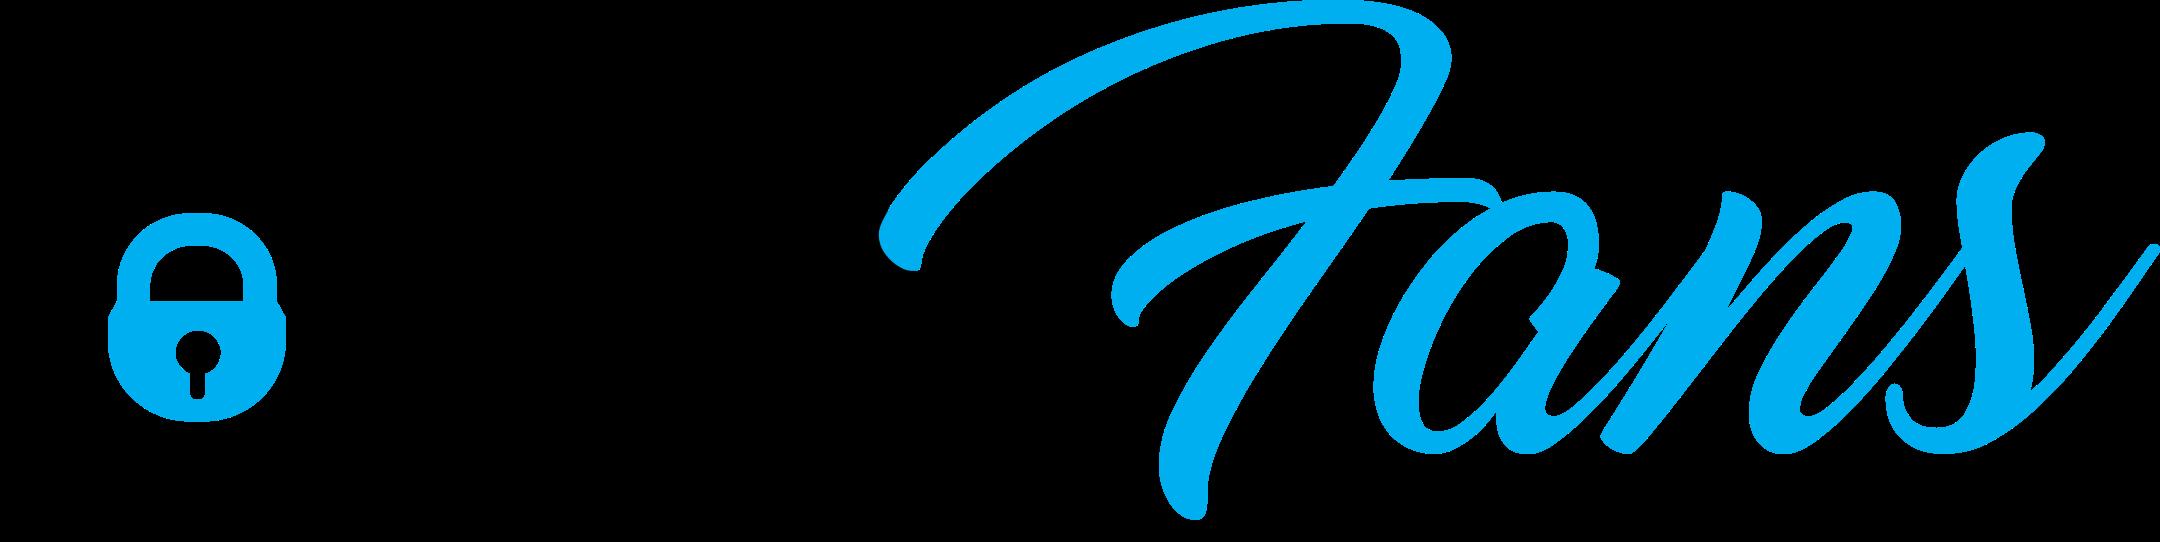 onlyfans logo 1 - OnlyFans Logo